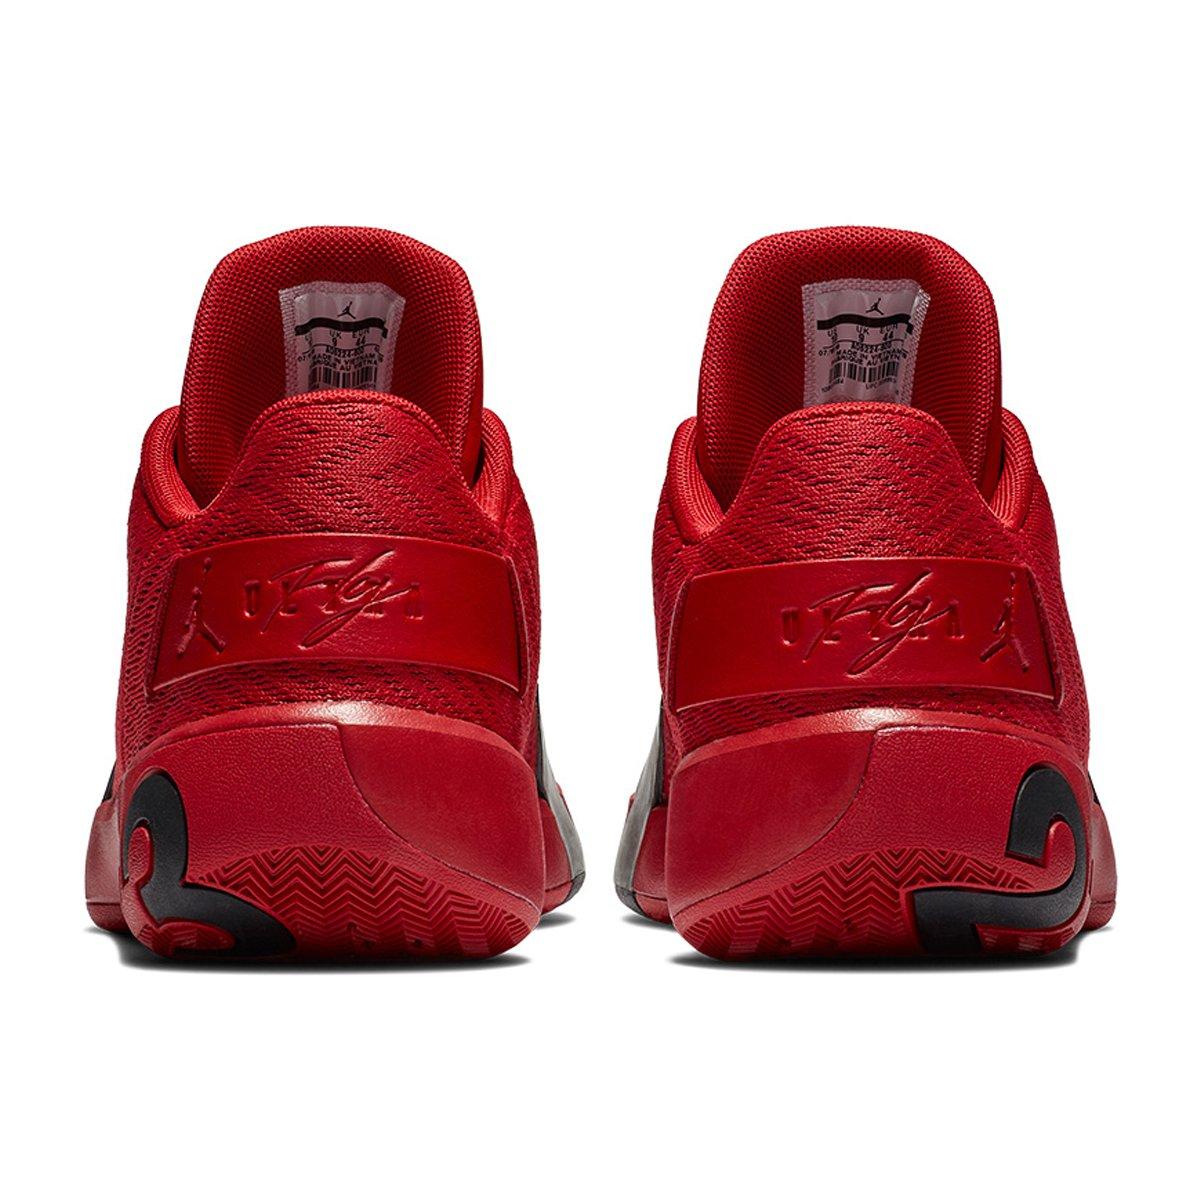 quality design f677f 5bd43 Tênis Nike Jordan Ultra Fly 3 Low Masculino - Vermelho e Preto